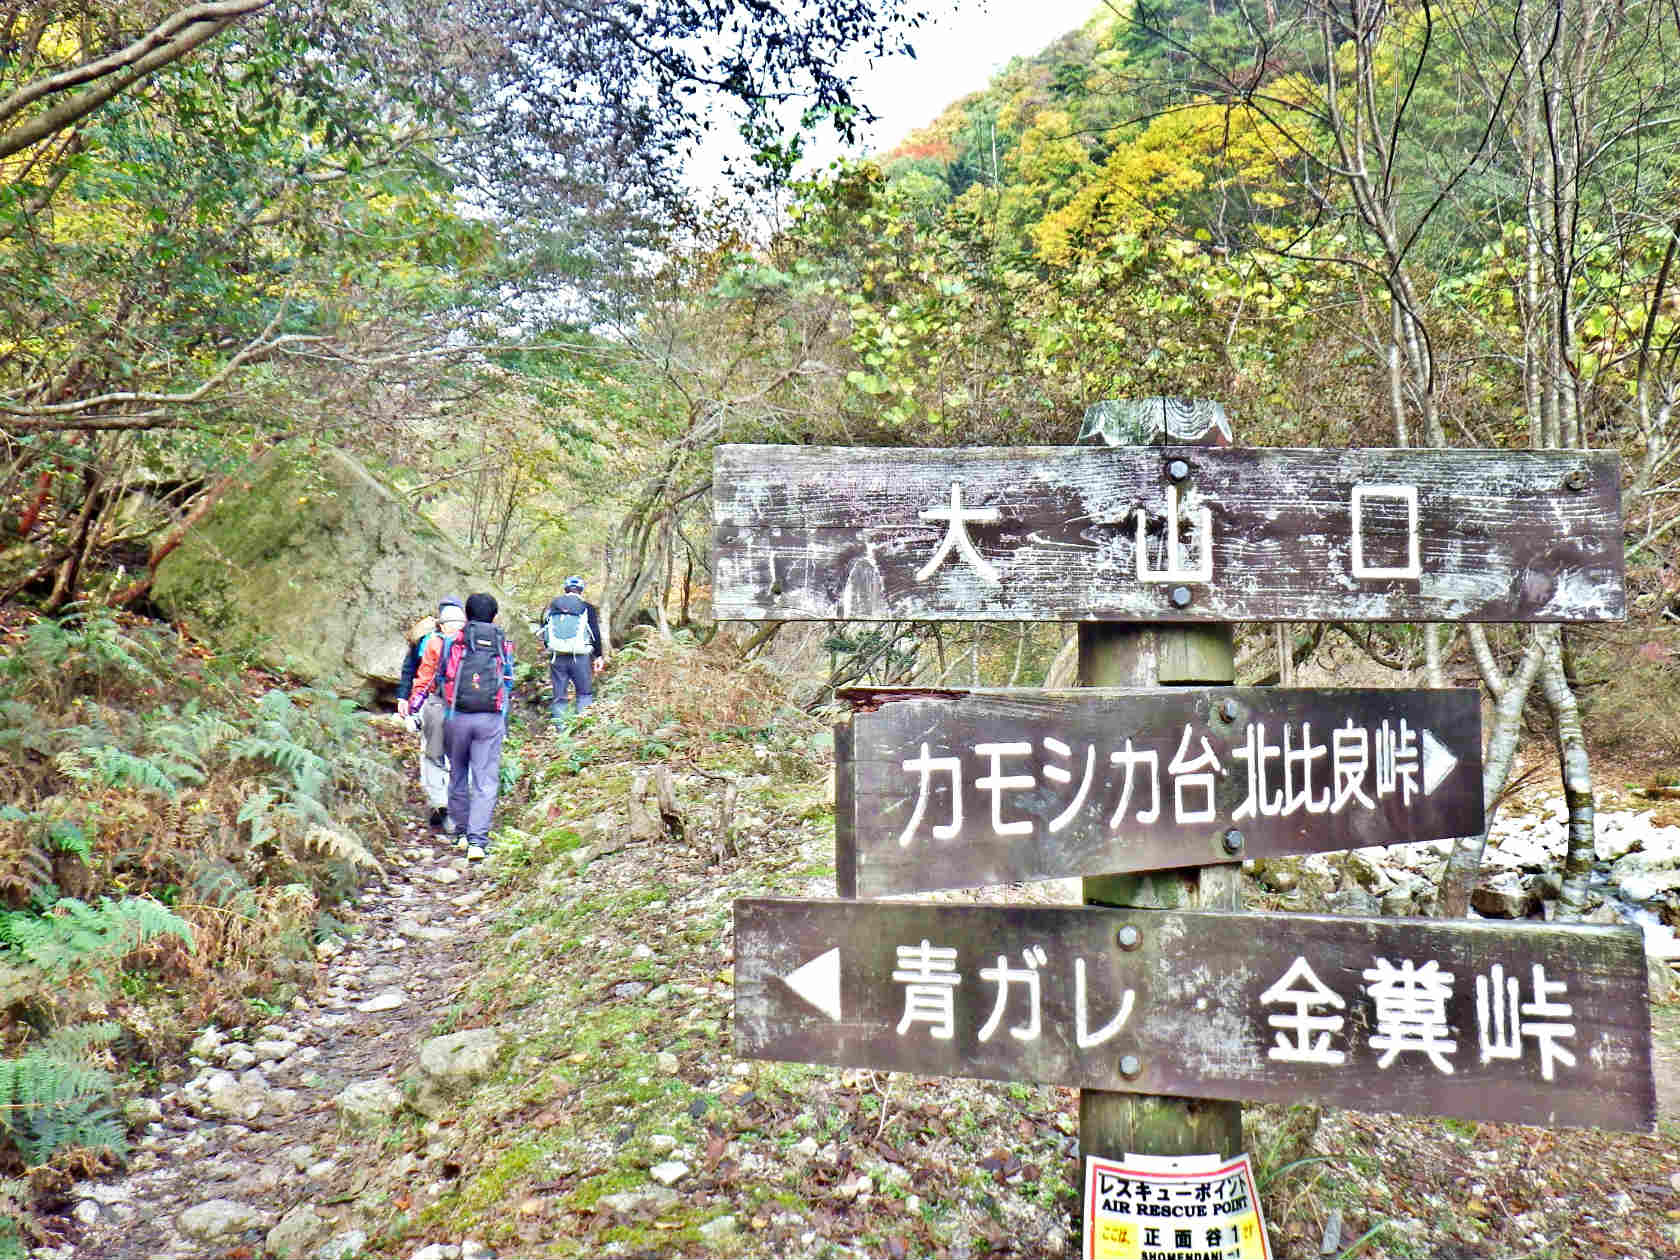 07a 大山口の分岐標識